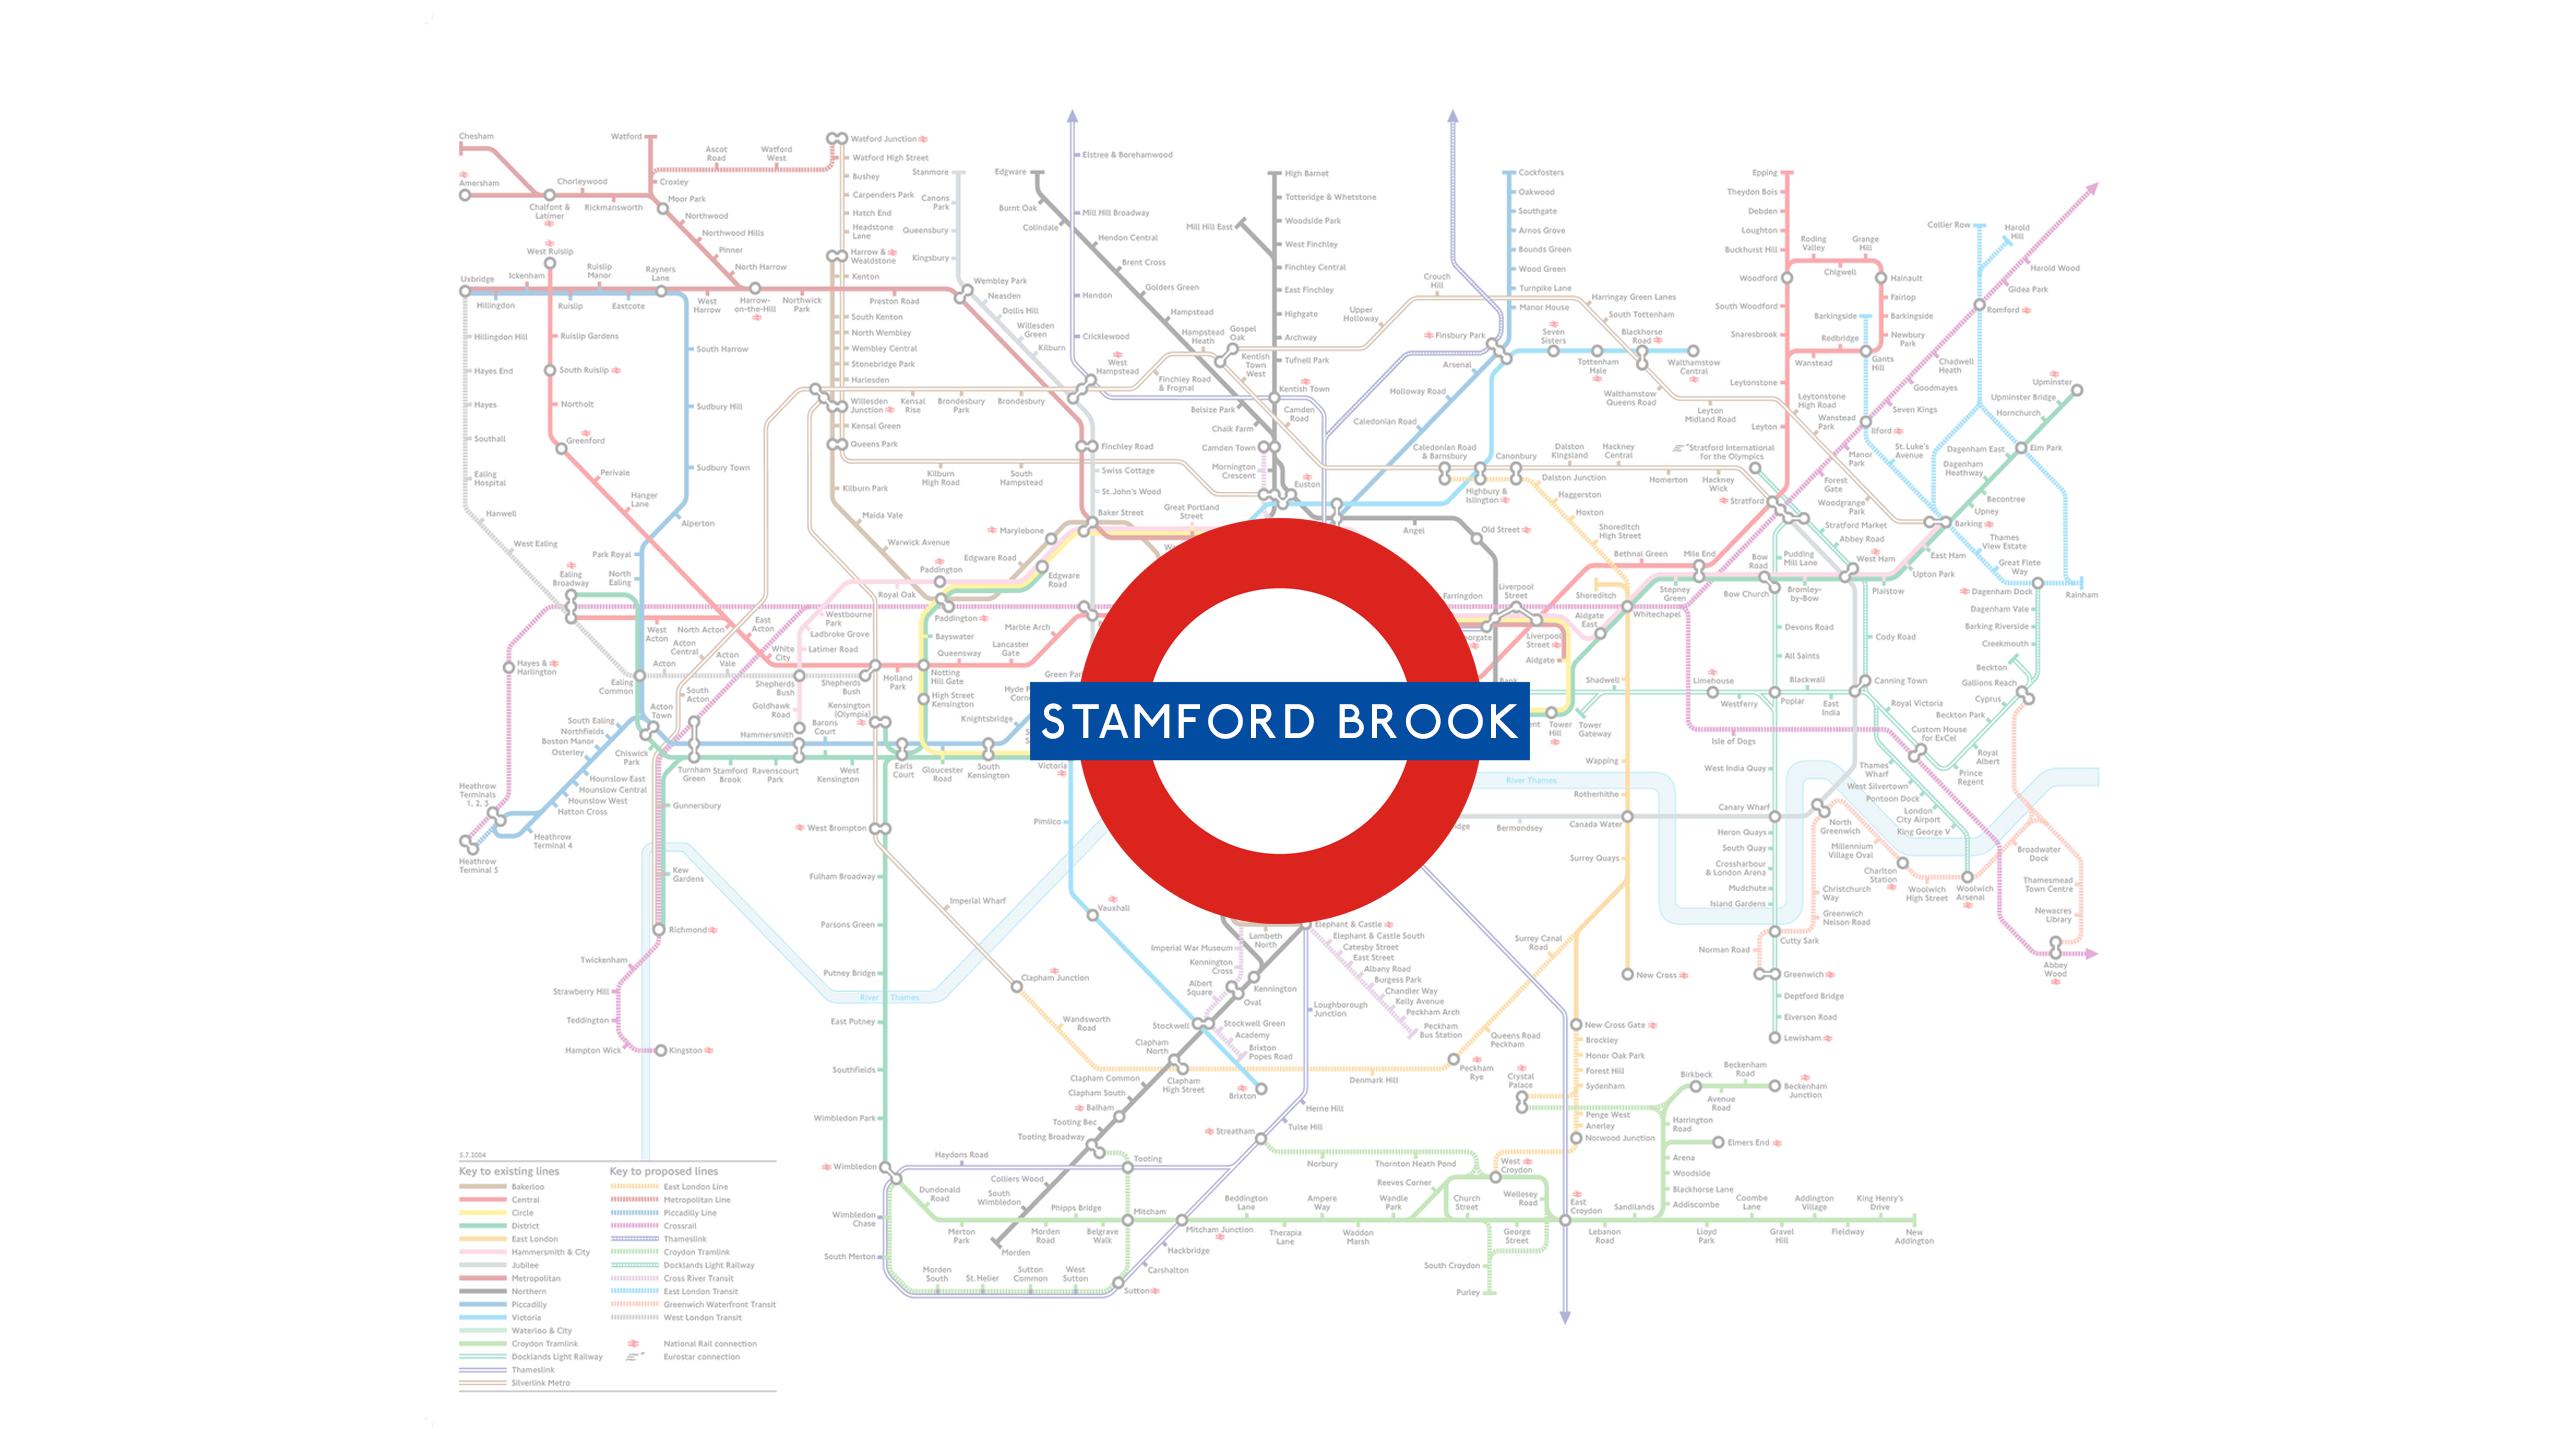 Stamford Brook (Map)